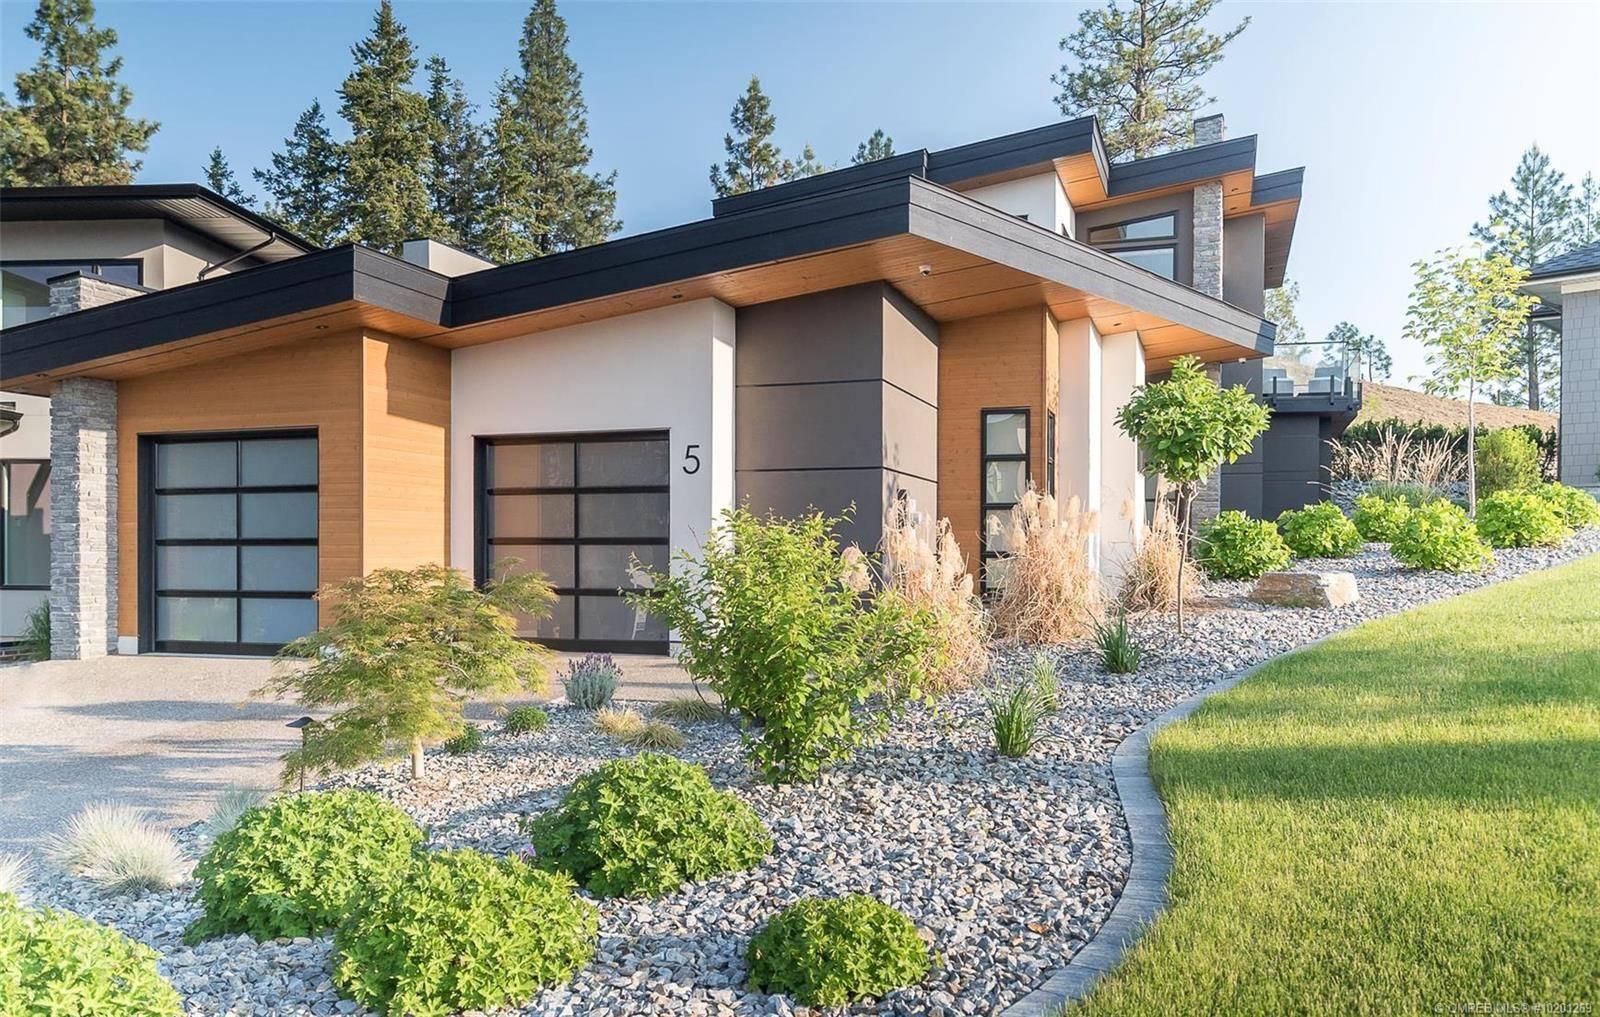 House for sale at 1150 Mission Ridge Rd Unit 5 Kelowna British Columbia - MLS: 10201269